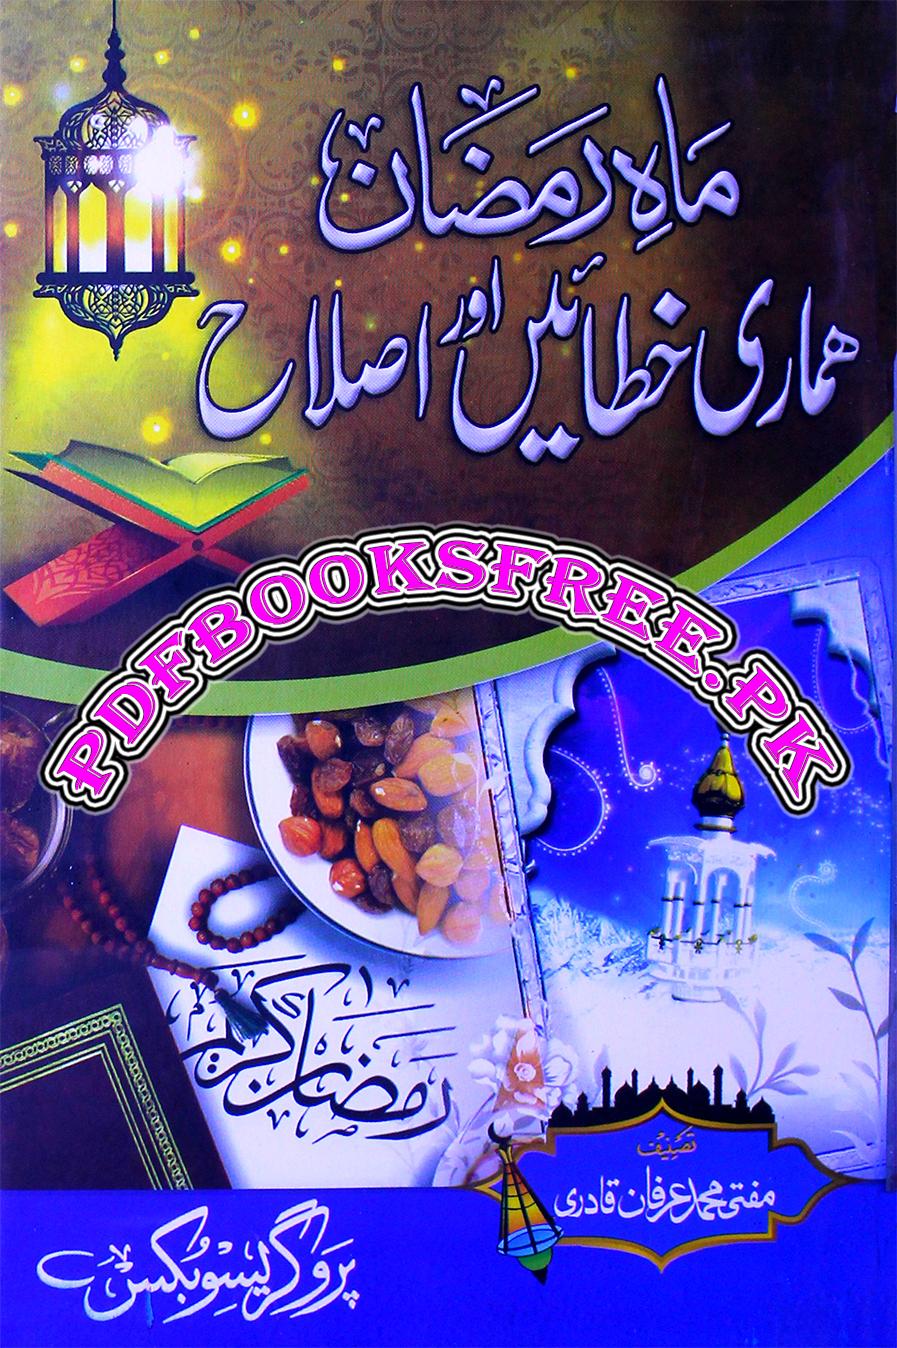 Maah e Ramazan Hamari Khatain Aur Islah by Mufti Muhammad Irfan Qadri Read online Free Download